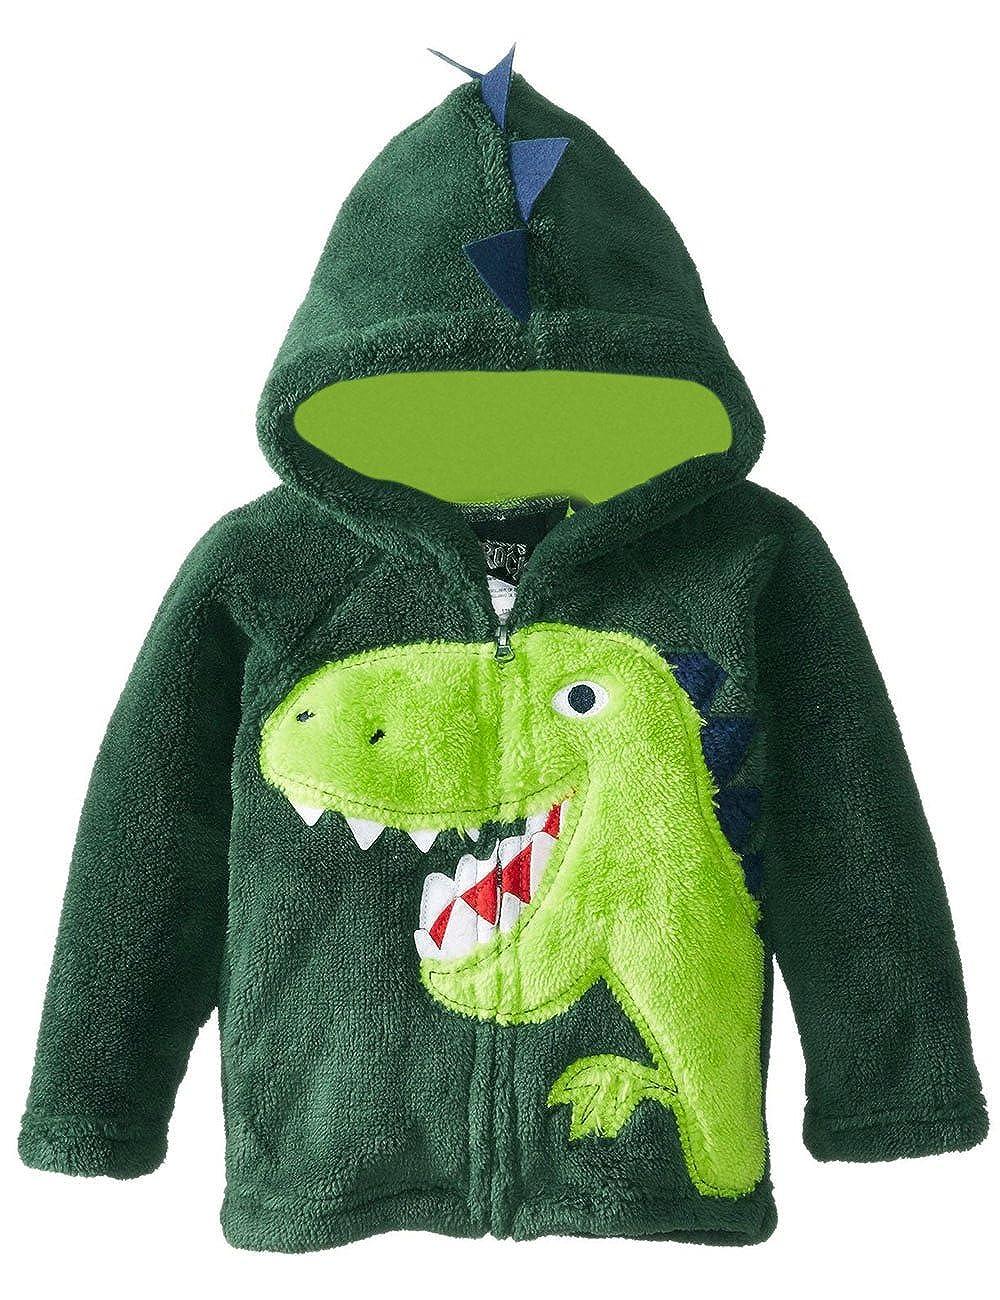 c4c560da0 Amazon.com  CM-Kid Little Boys Dinosaur Jacket Baby Hoodies Winter ...